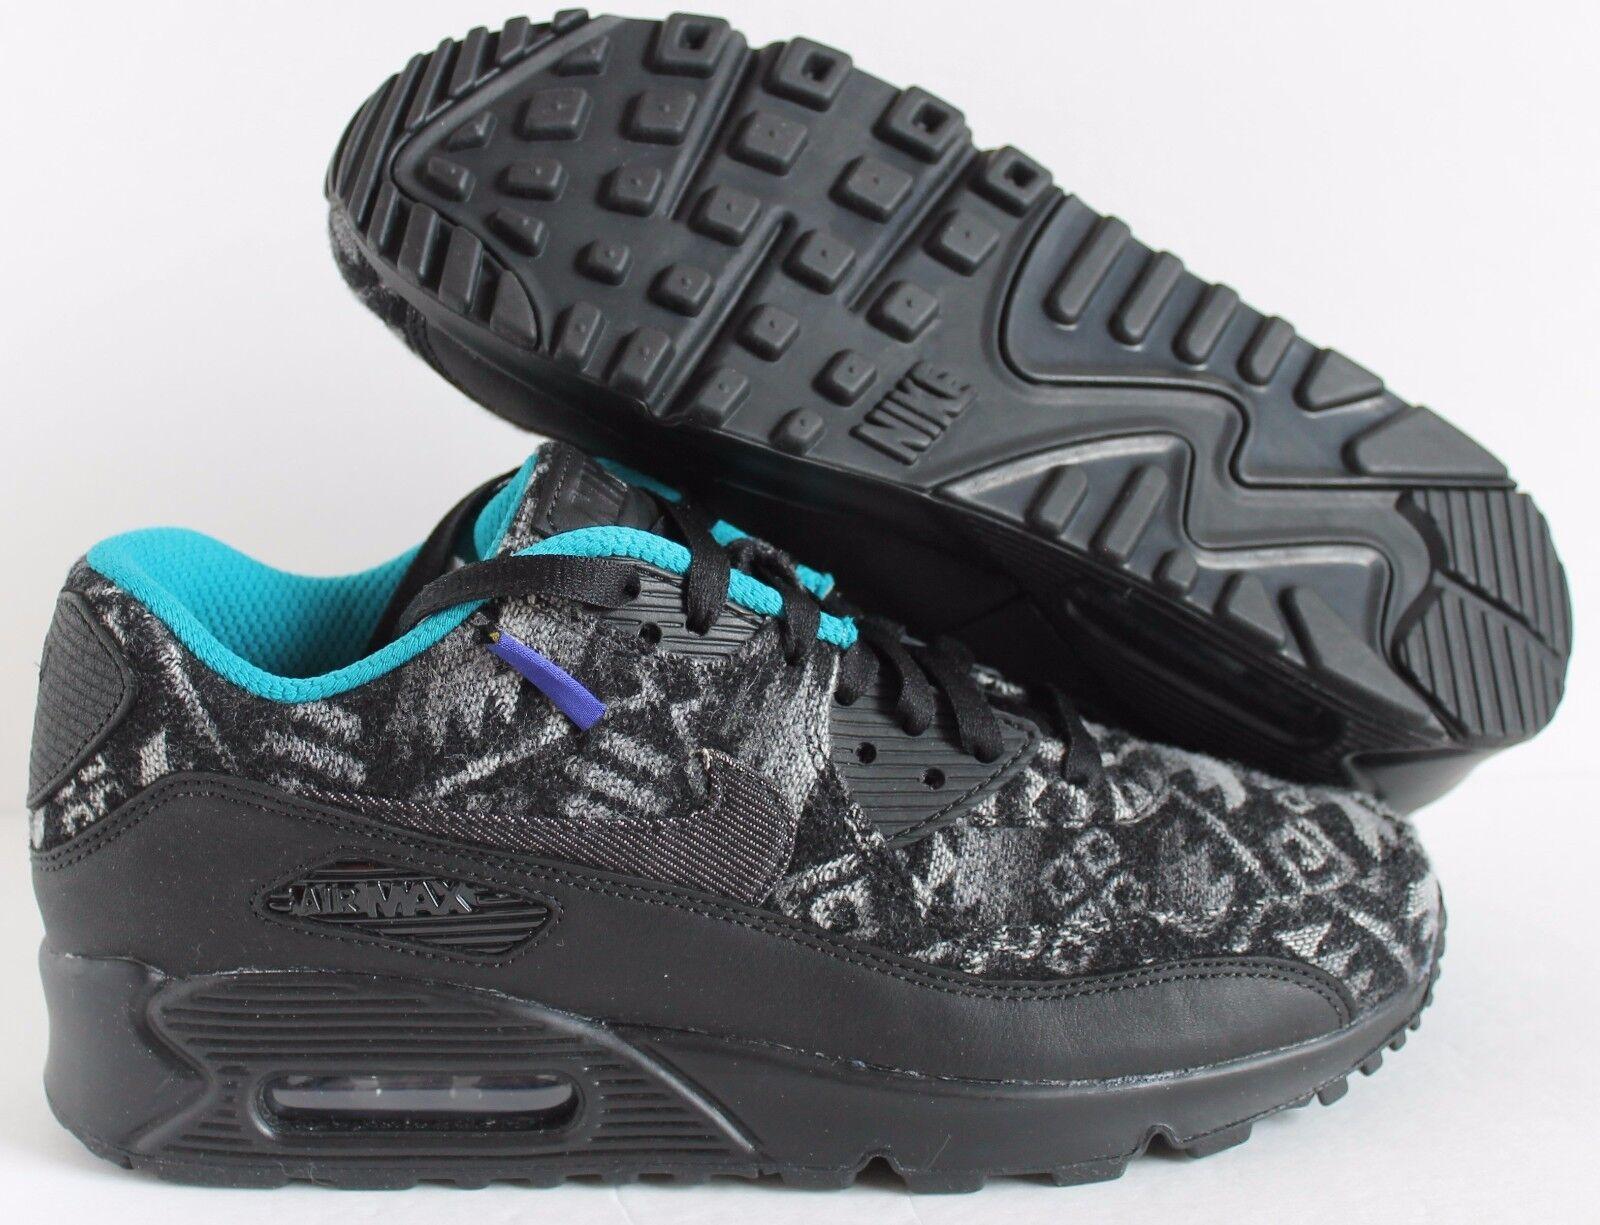 Nike Air Max Black-White-Turquoise 90 Premium Pendelton ID Black-White-Turquoise Max  SZ 8.5  [838675-901] dbf357